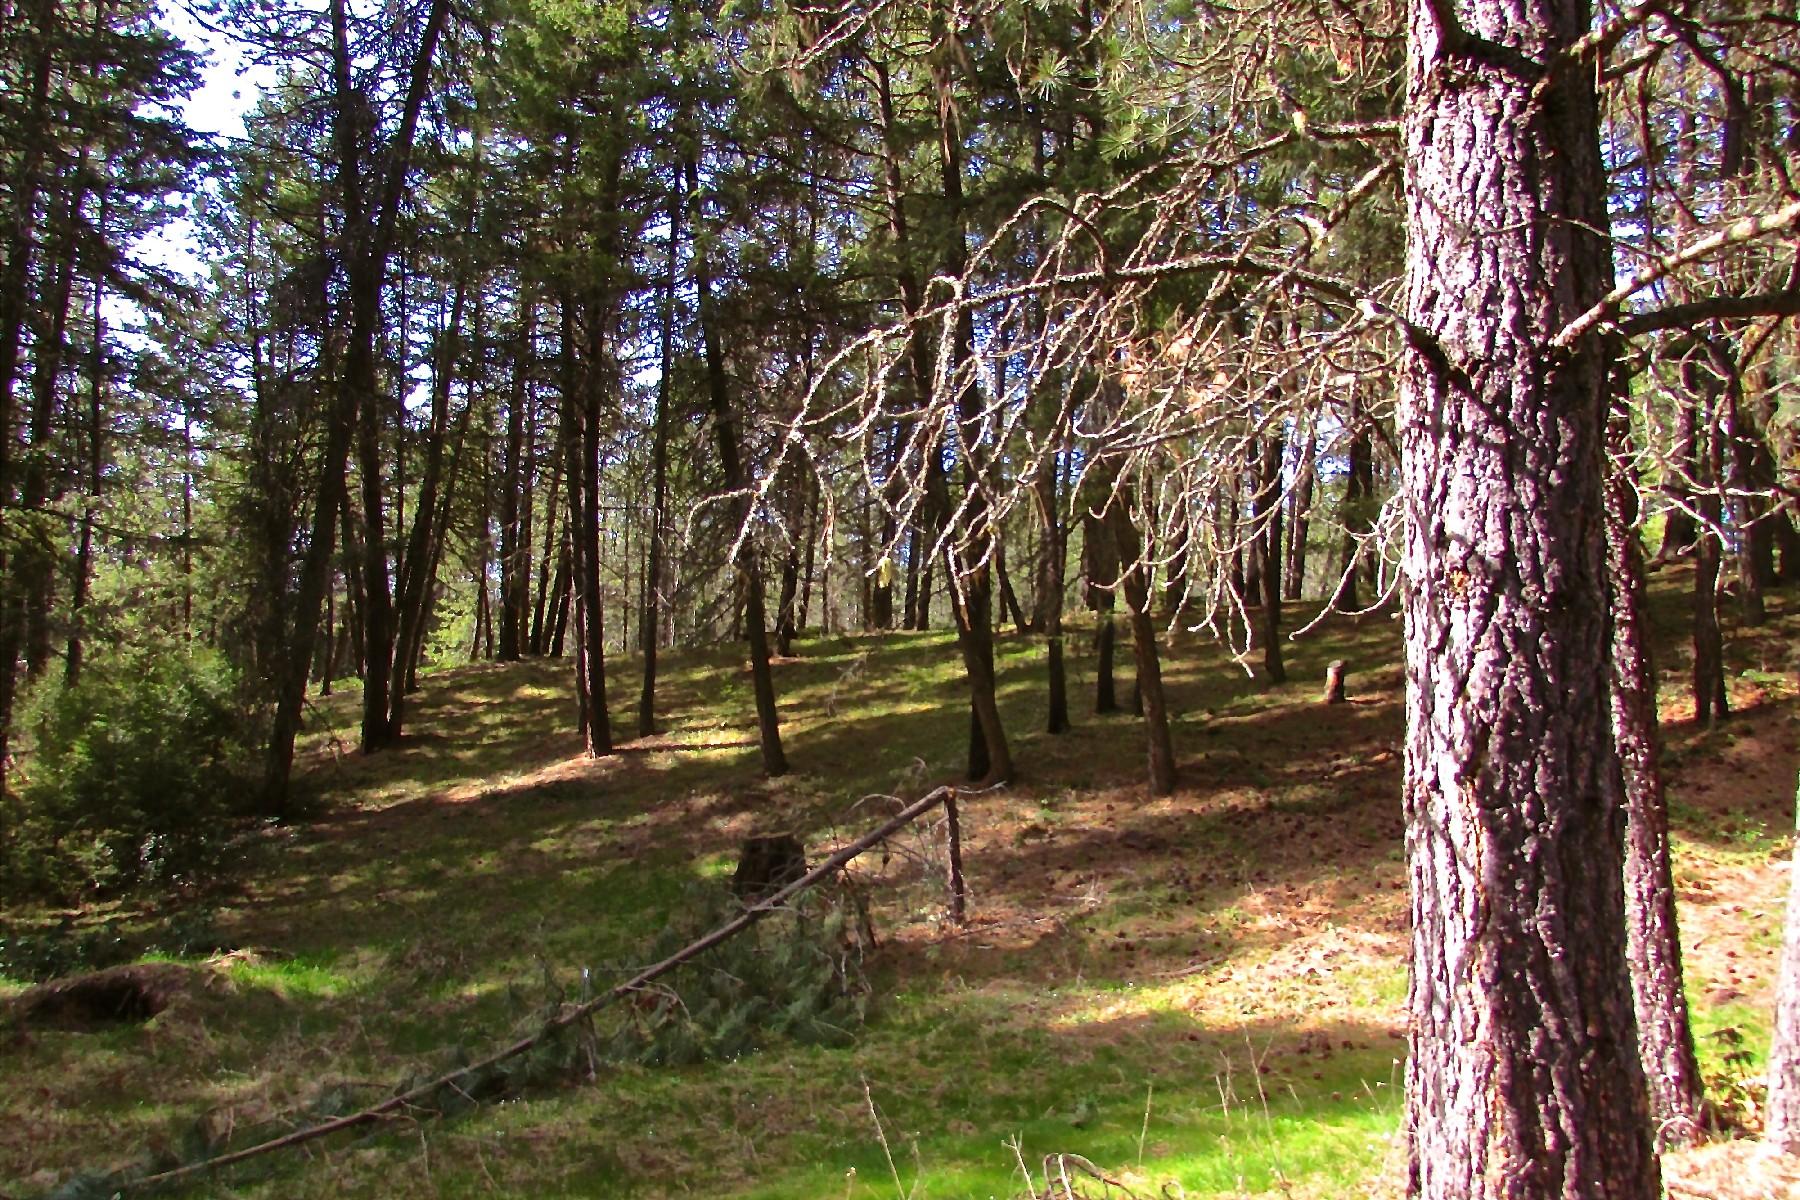 Land for Sale at On the 19th Hole! NKA Blk1 lot 1516 Hanaford Blanchard, Idaho, 83804 United States